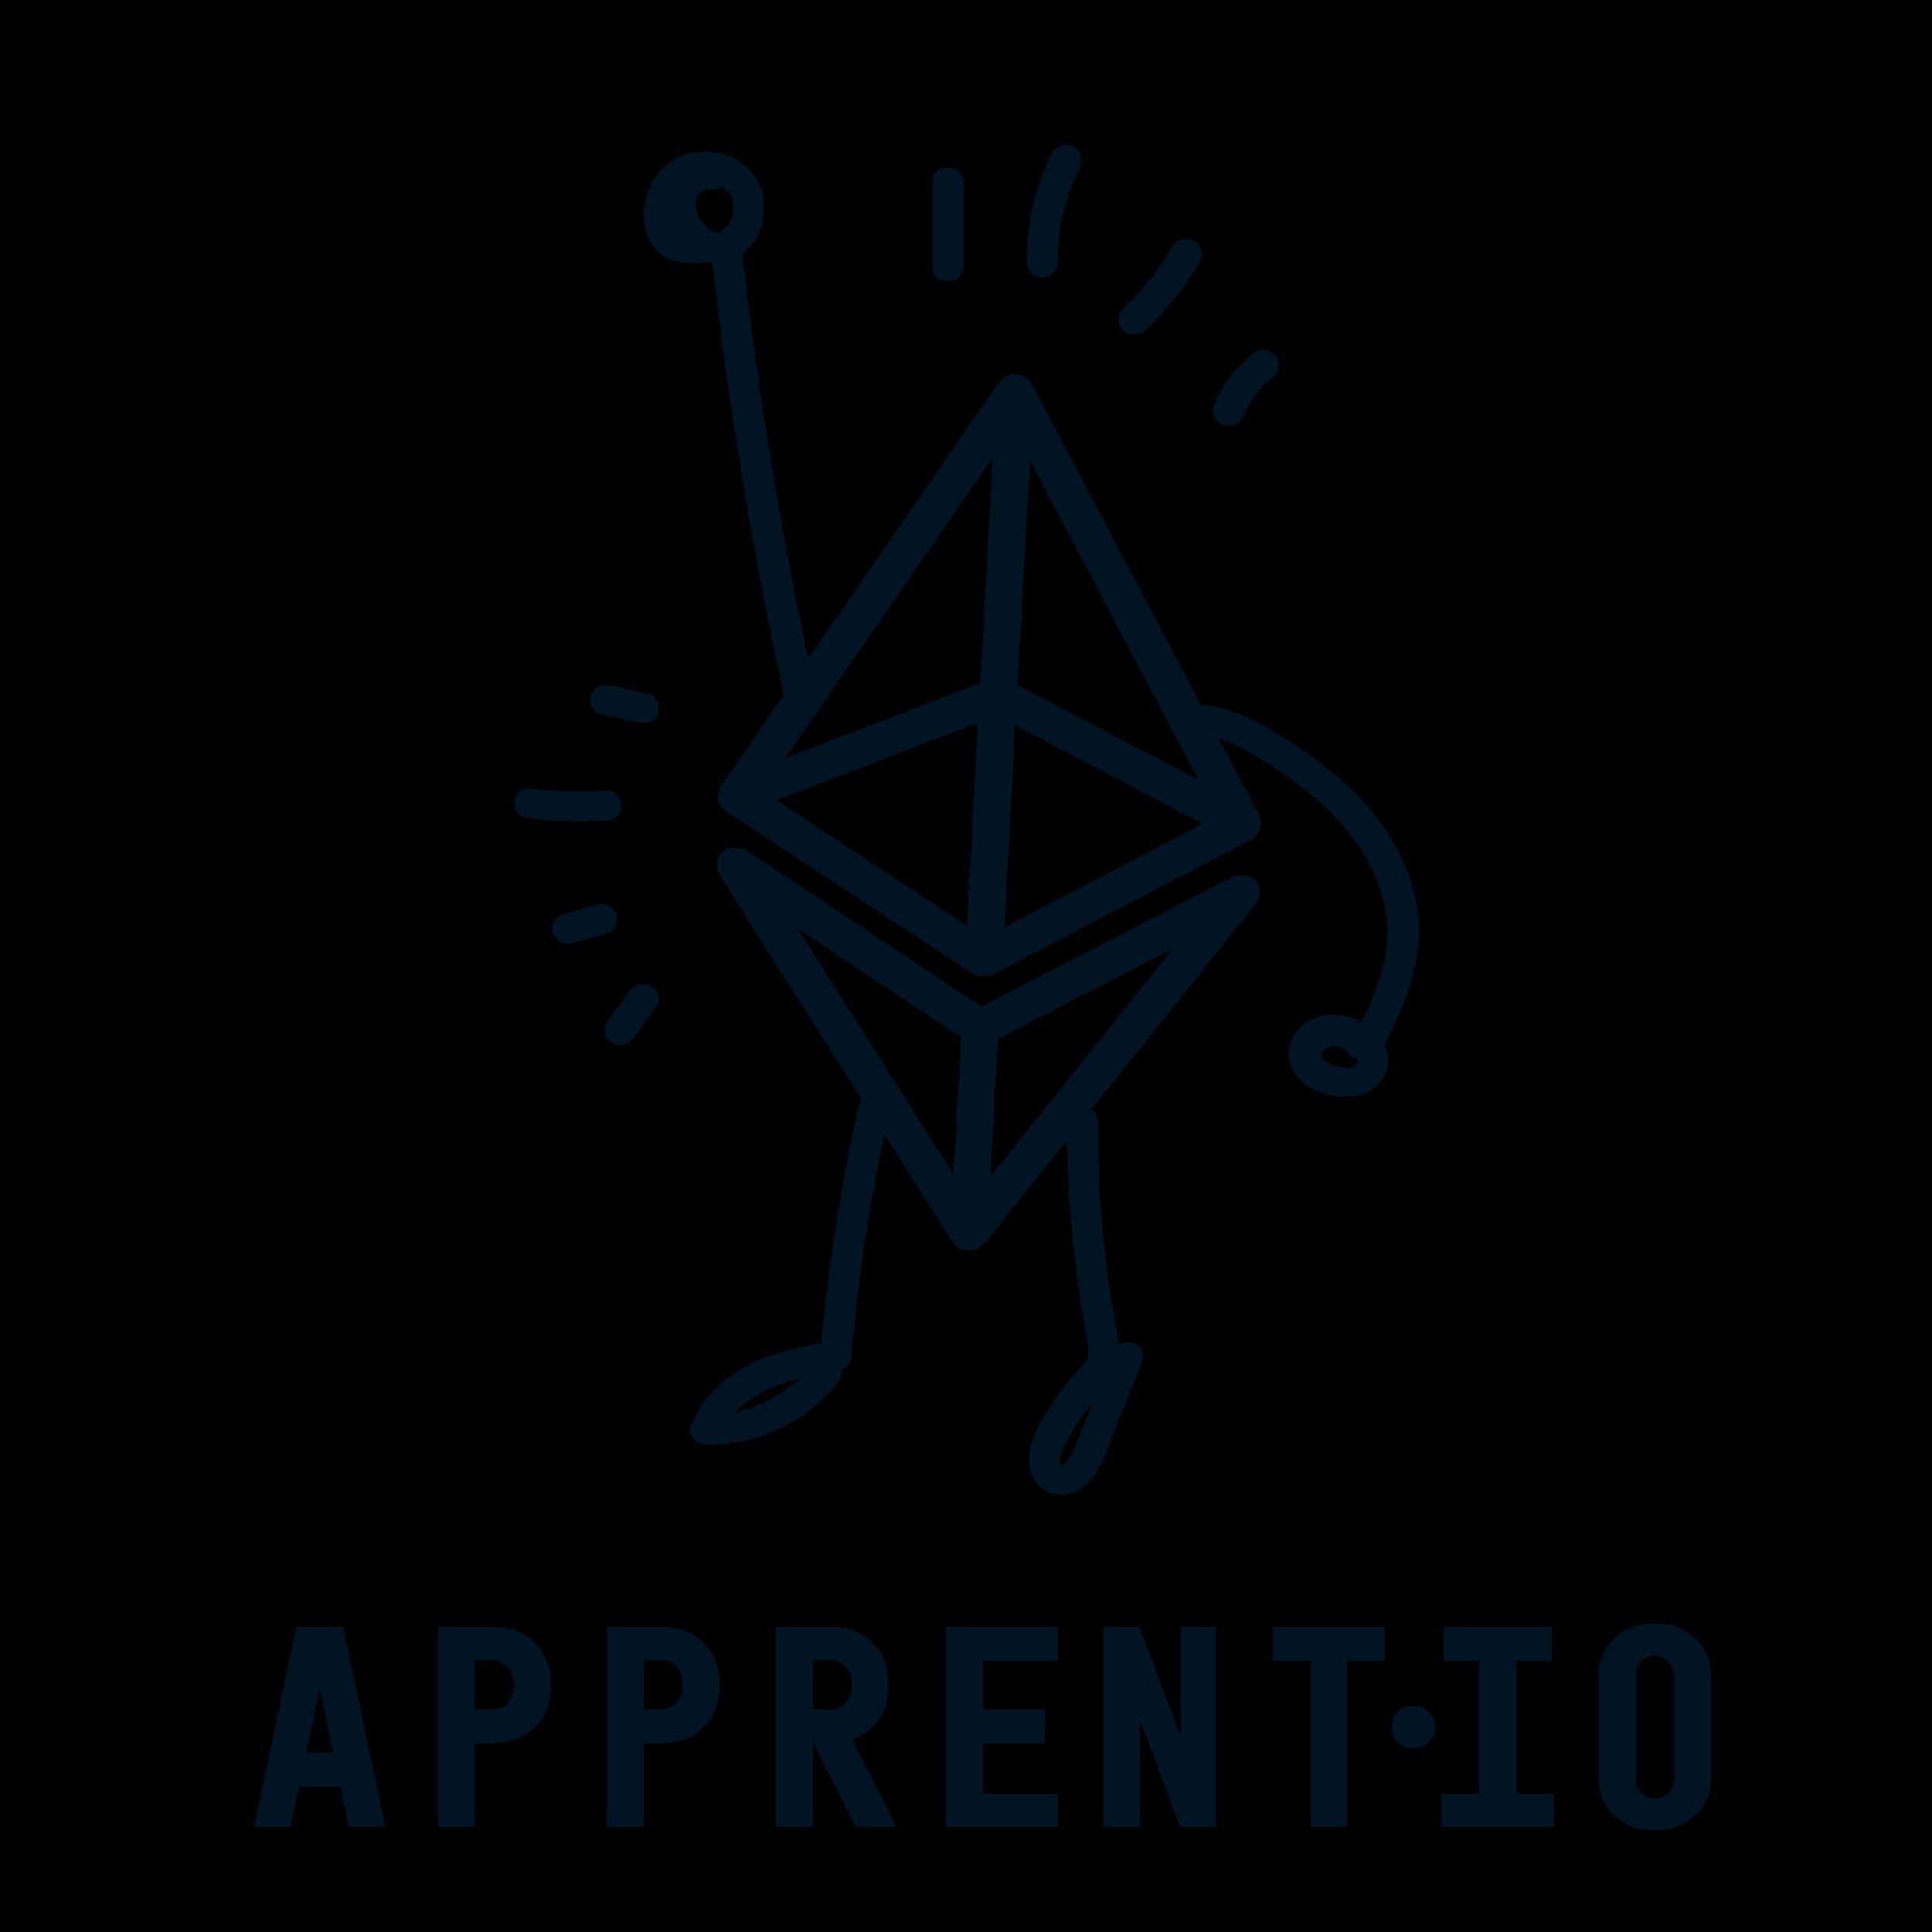 APPRENTIO-01.png